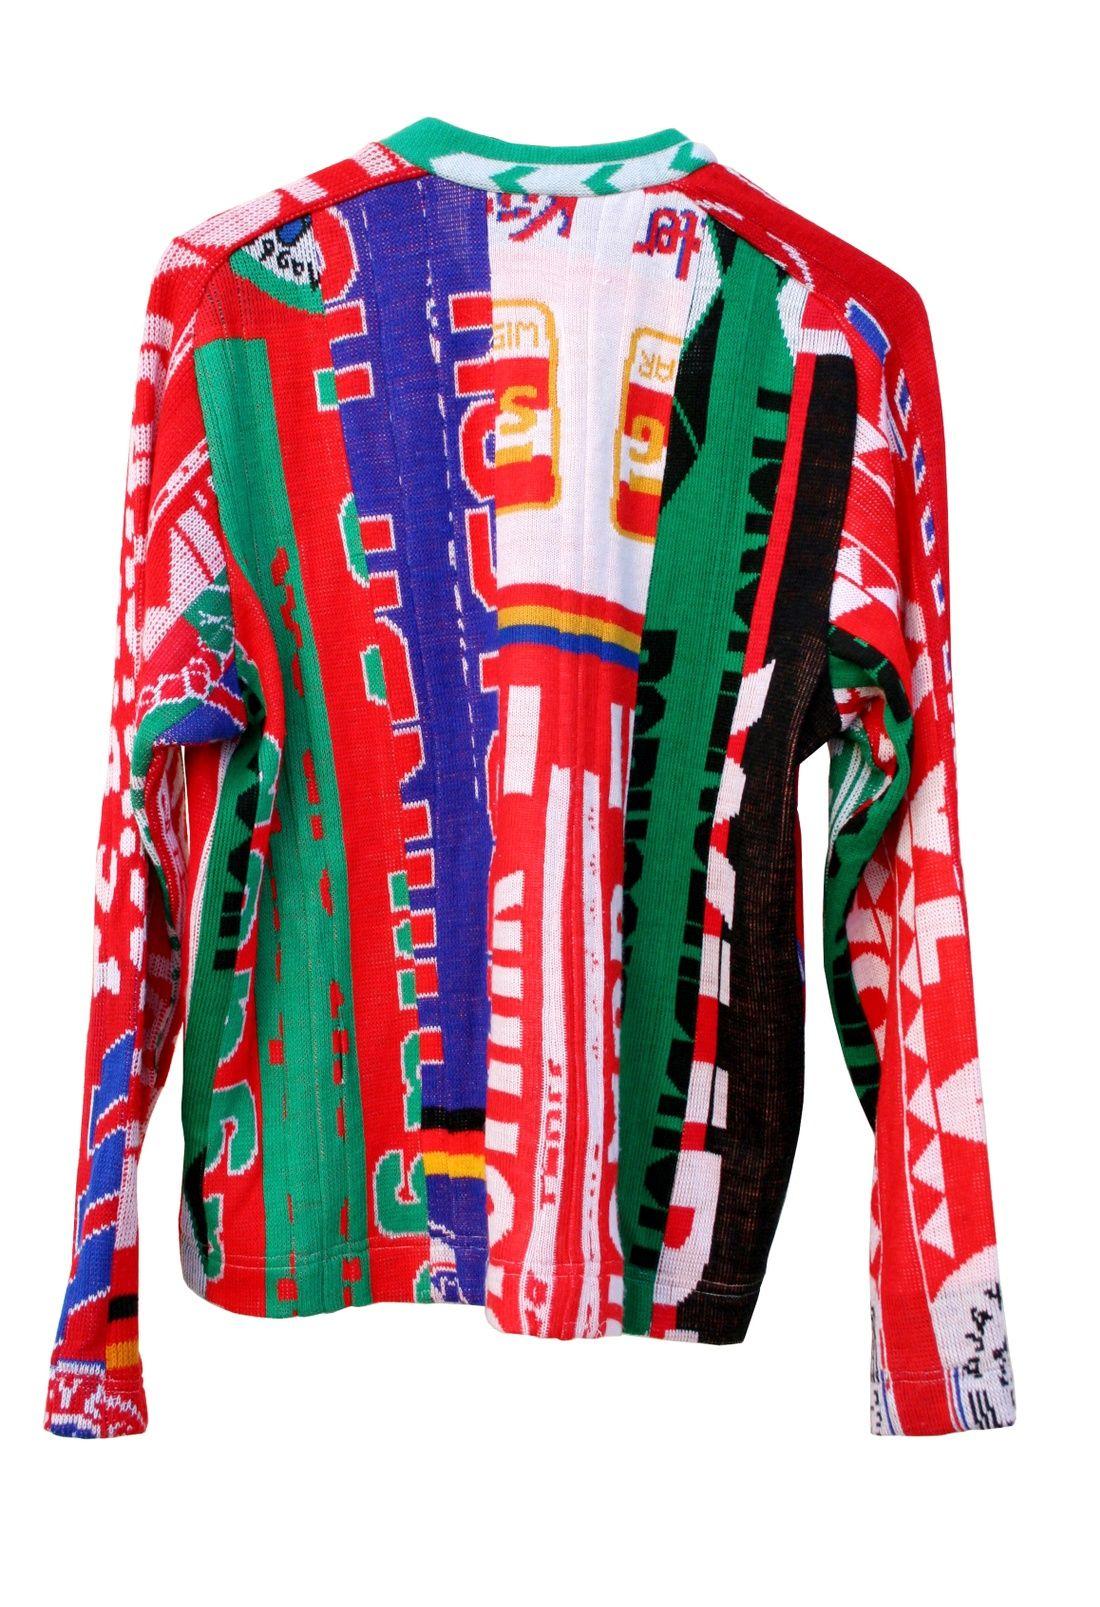 1bd864f89e Maison Margiela Martin Margiela Artisanal Sweater Size L  835 - Grailed